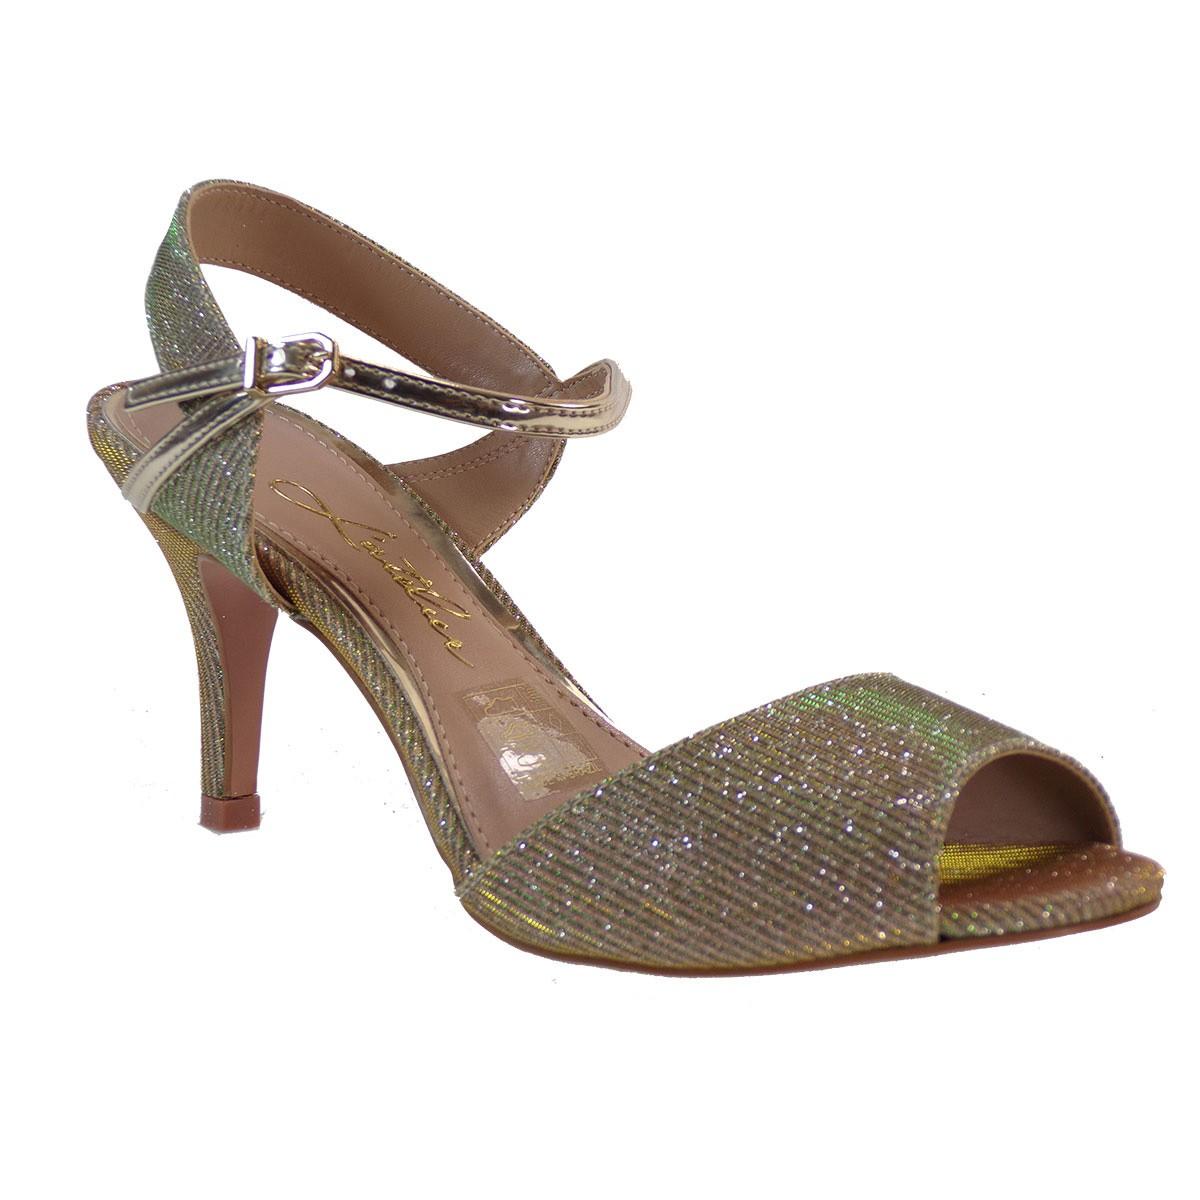 L'ATELIER Γυναικεία Παπούτσια Πέδιλα 1031-80667 Χρυσό 887292693